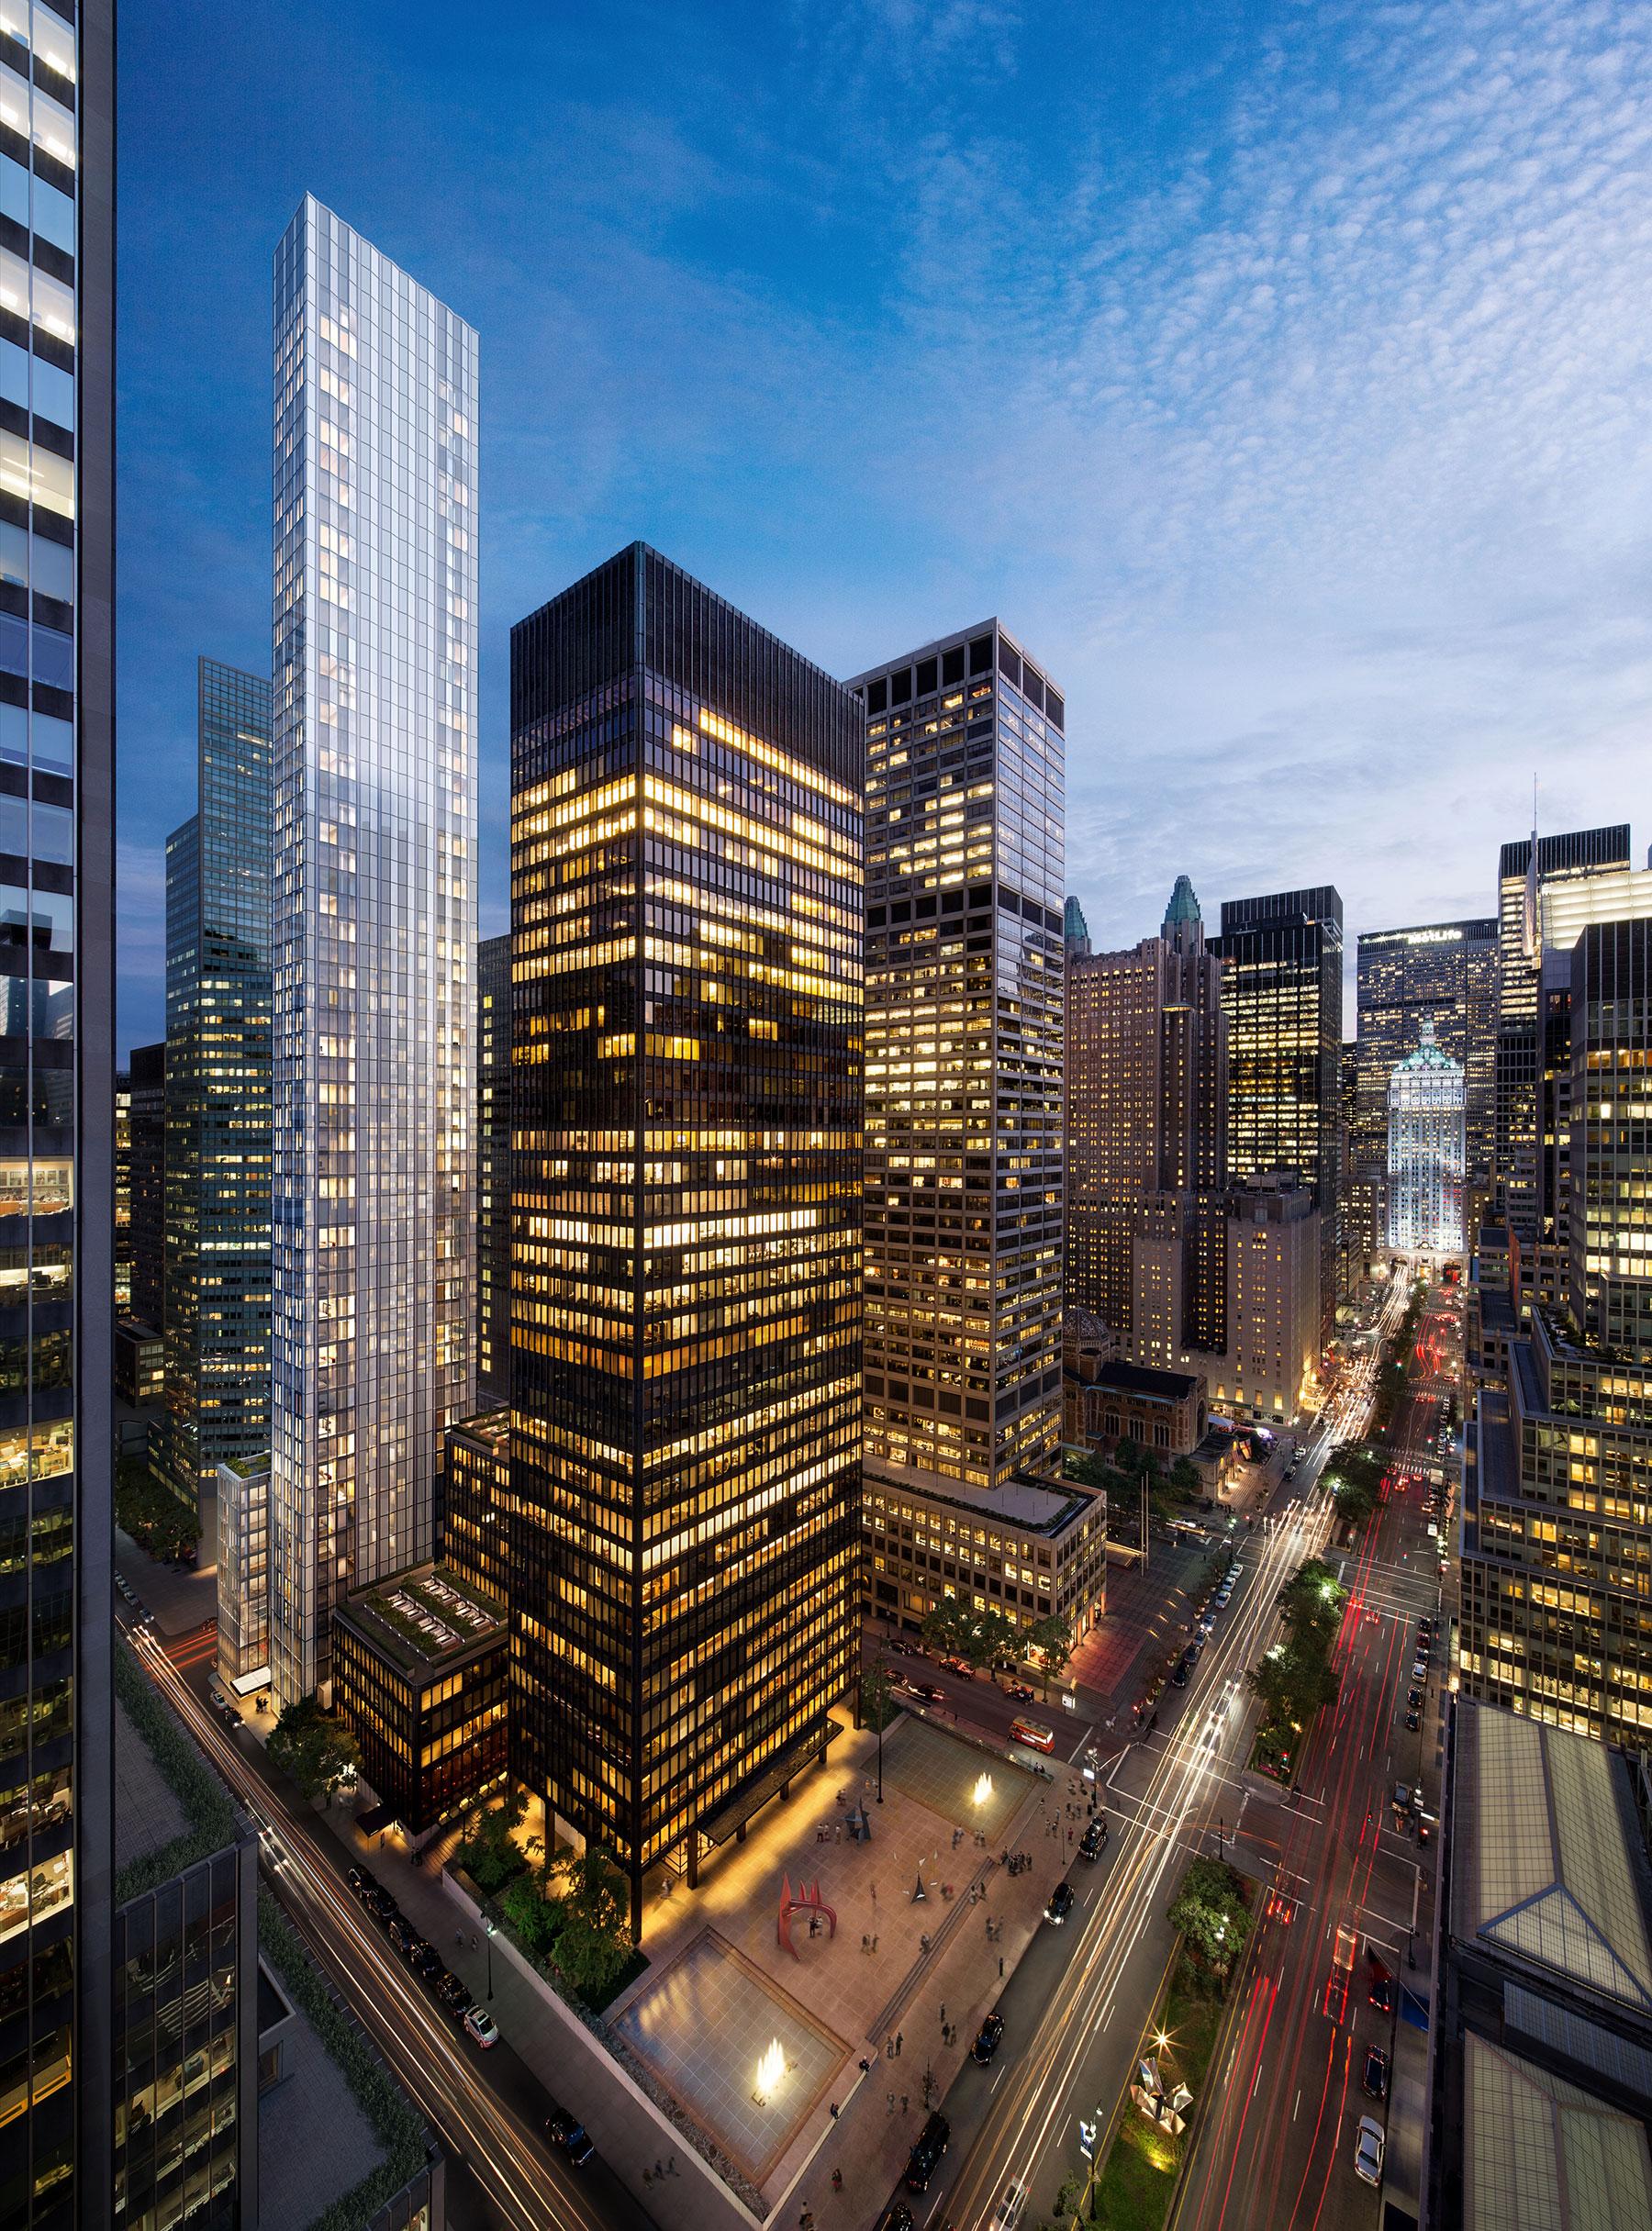 100 East 53rd Street